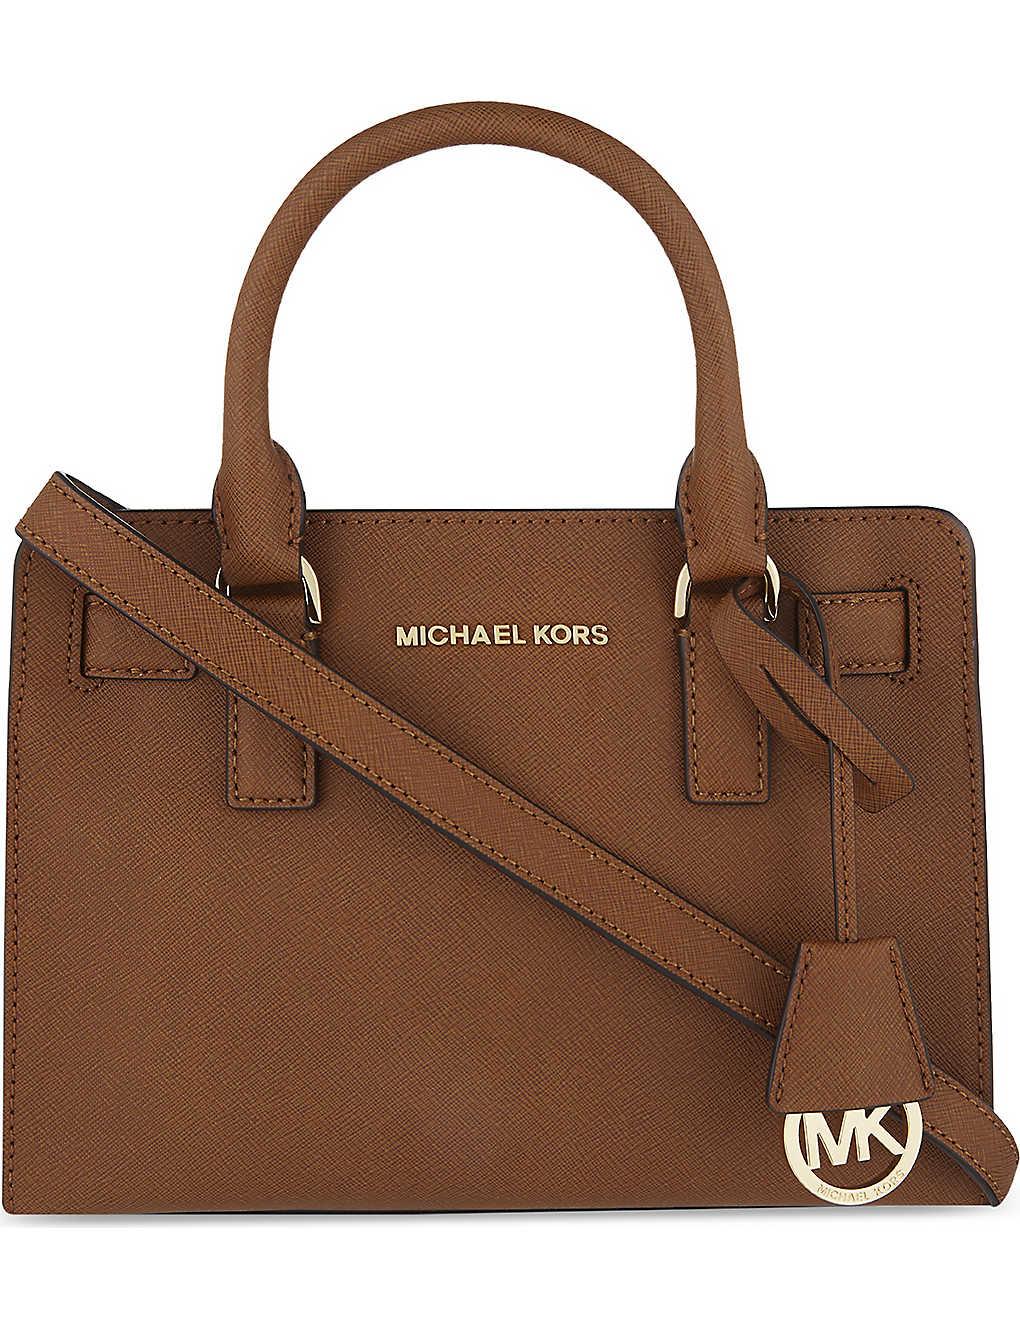 b5d229aa407d70 MICHAEL MICHAEL KORS - Dillon saffiano leather satchel | Selfridges.com